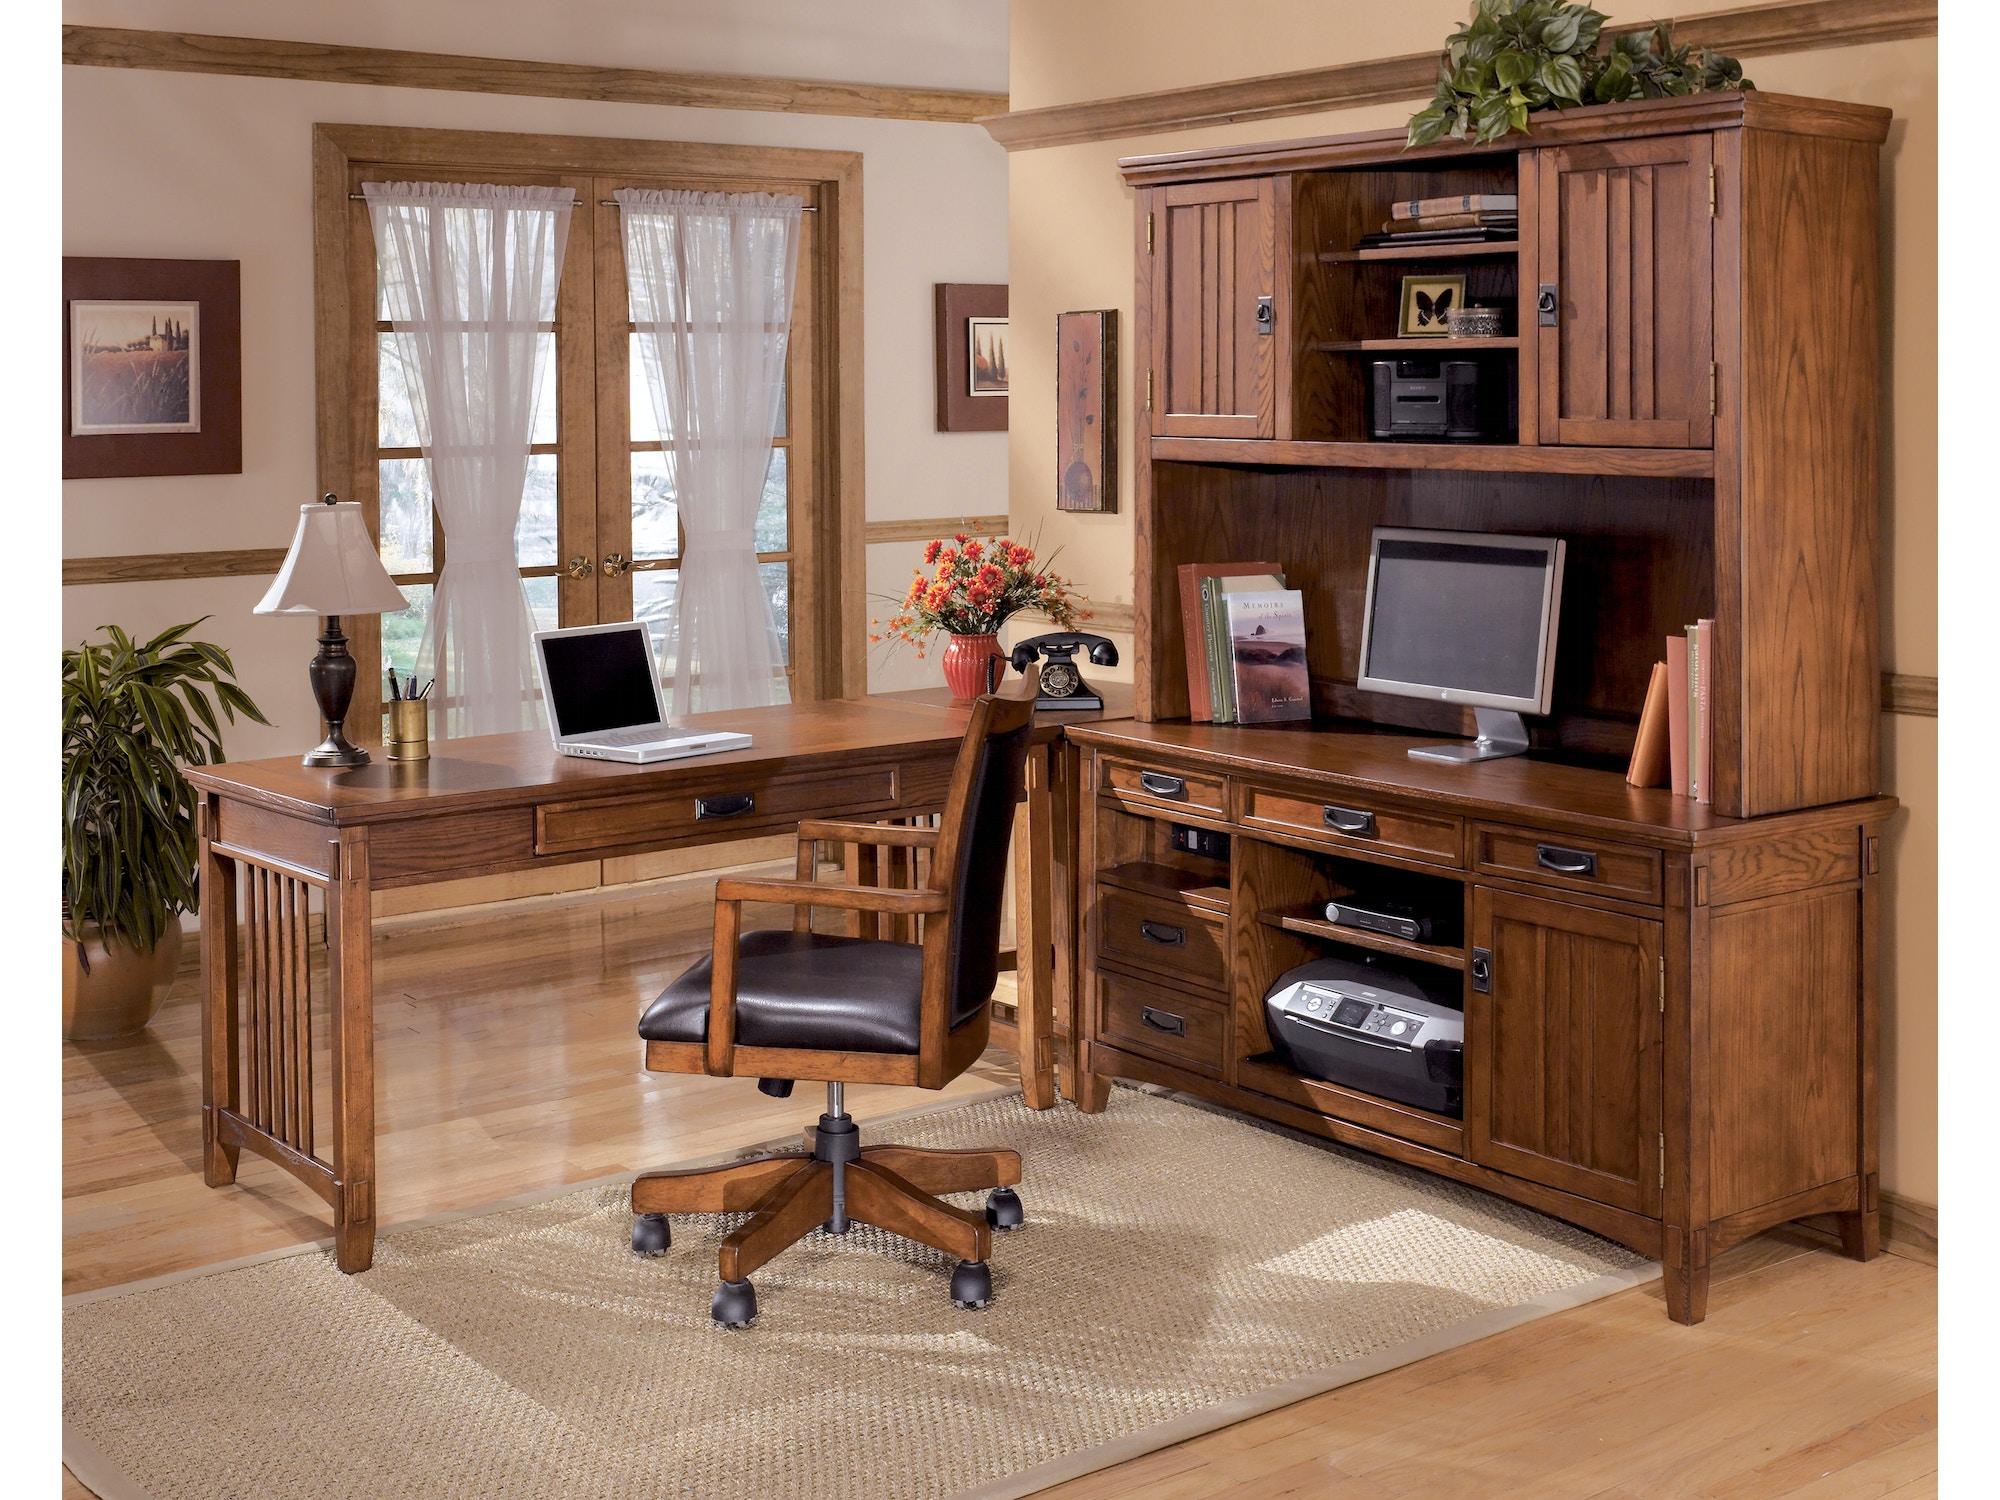 Home Office Furniture Cincinnati office furniture cincinnati home office furniture in cincinnati dayton amp northern ky 448759 Cross Island Home Office